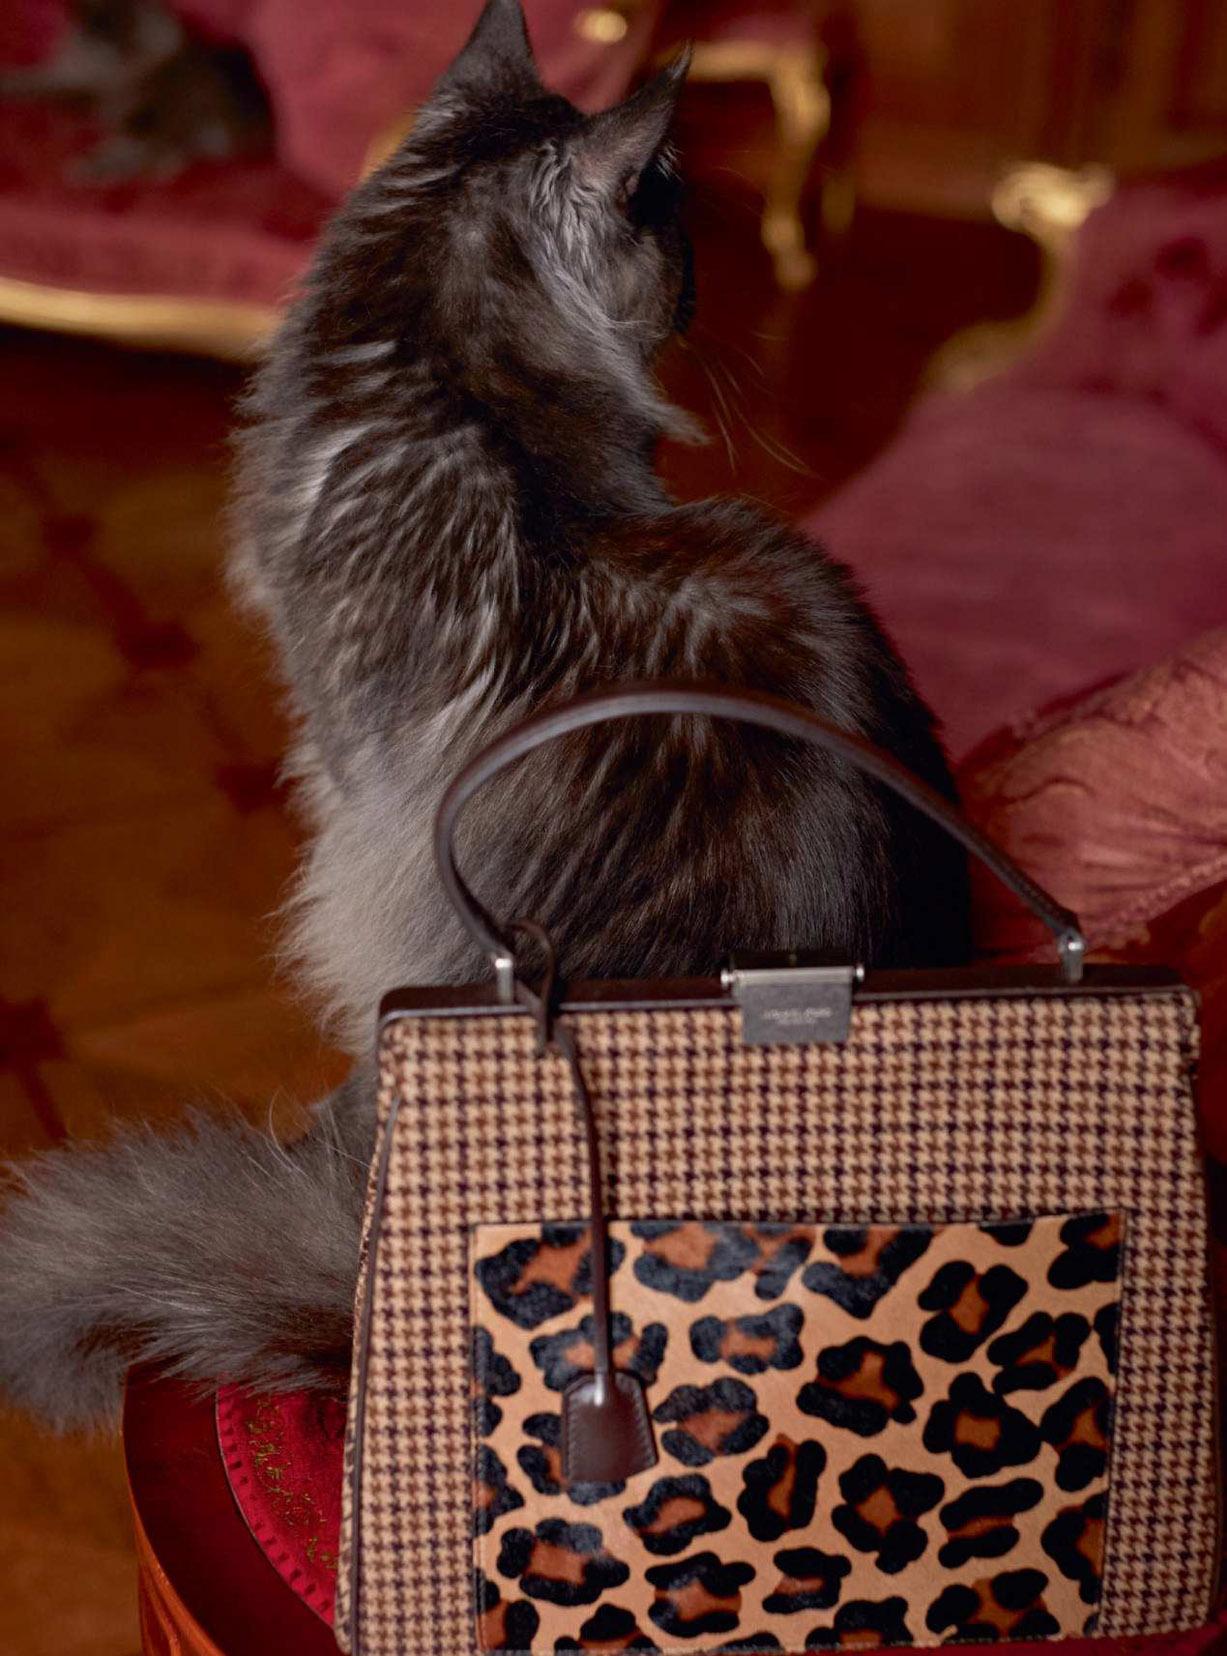 Девушка с кошками / CatWoman - Florence Kosky by Agata Pospieszynska - Harpers Bazaar UK september 2018